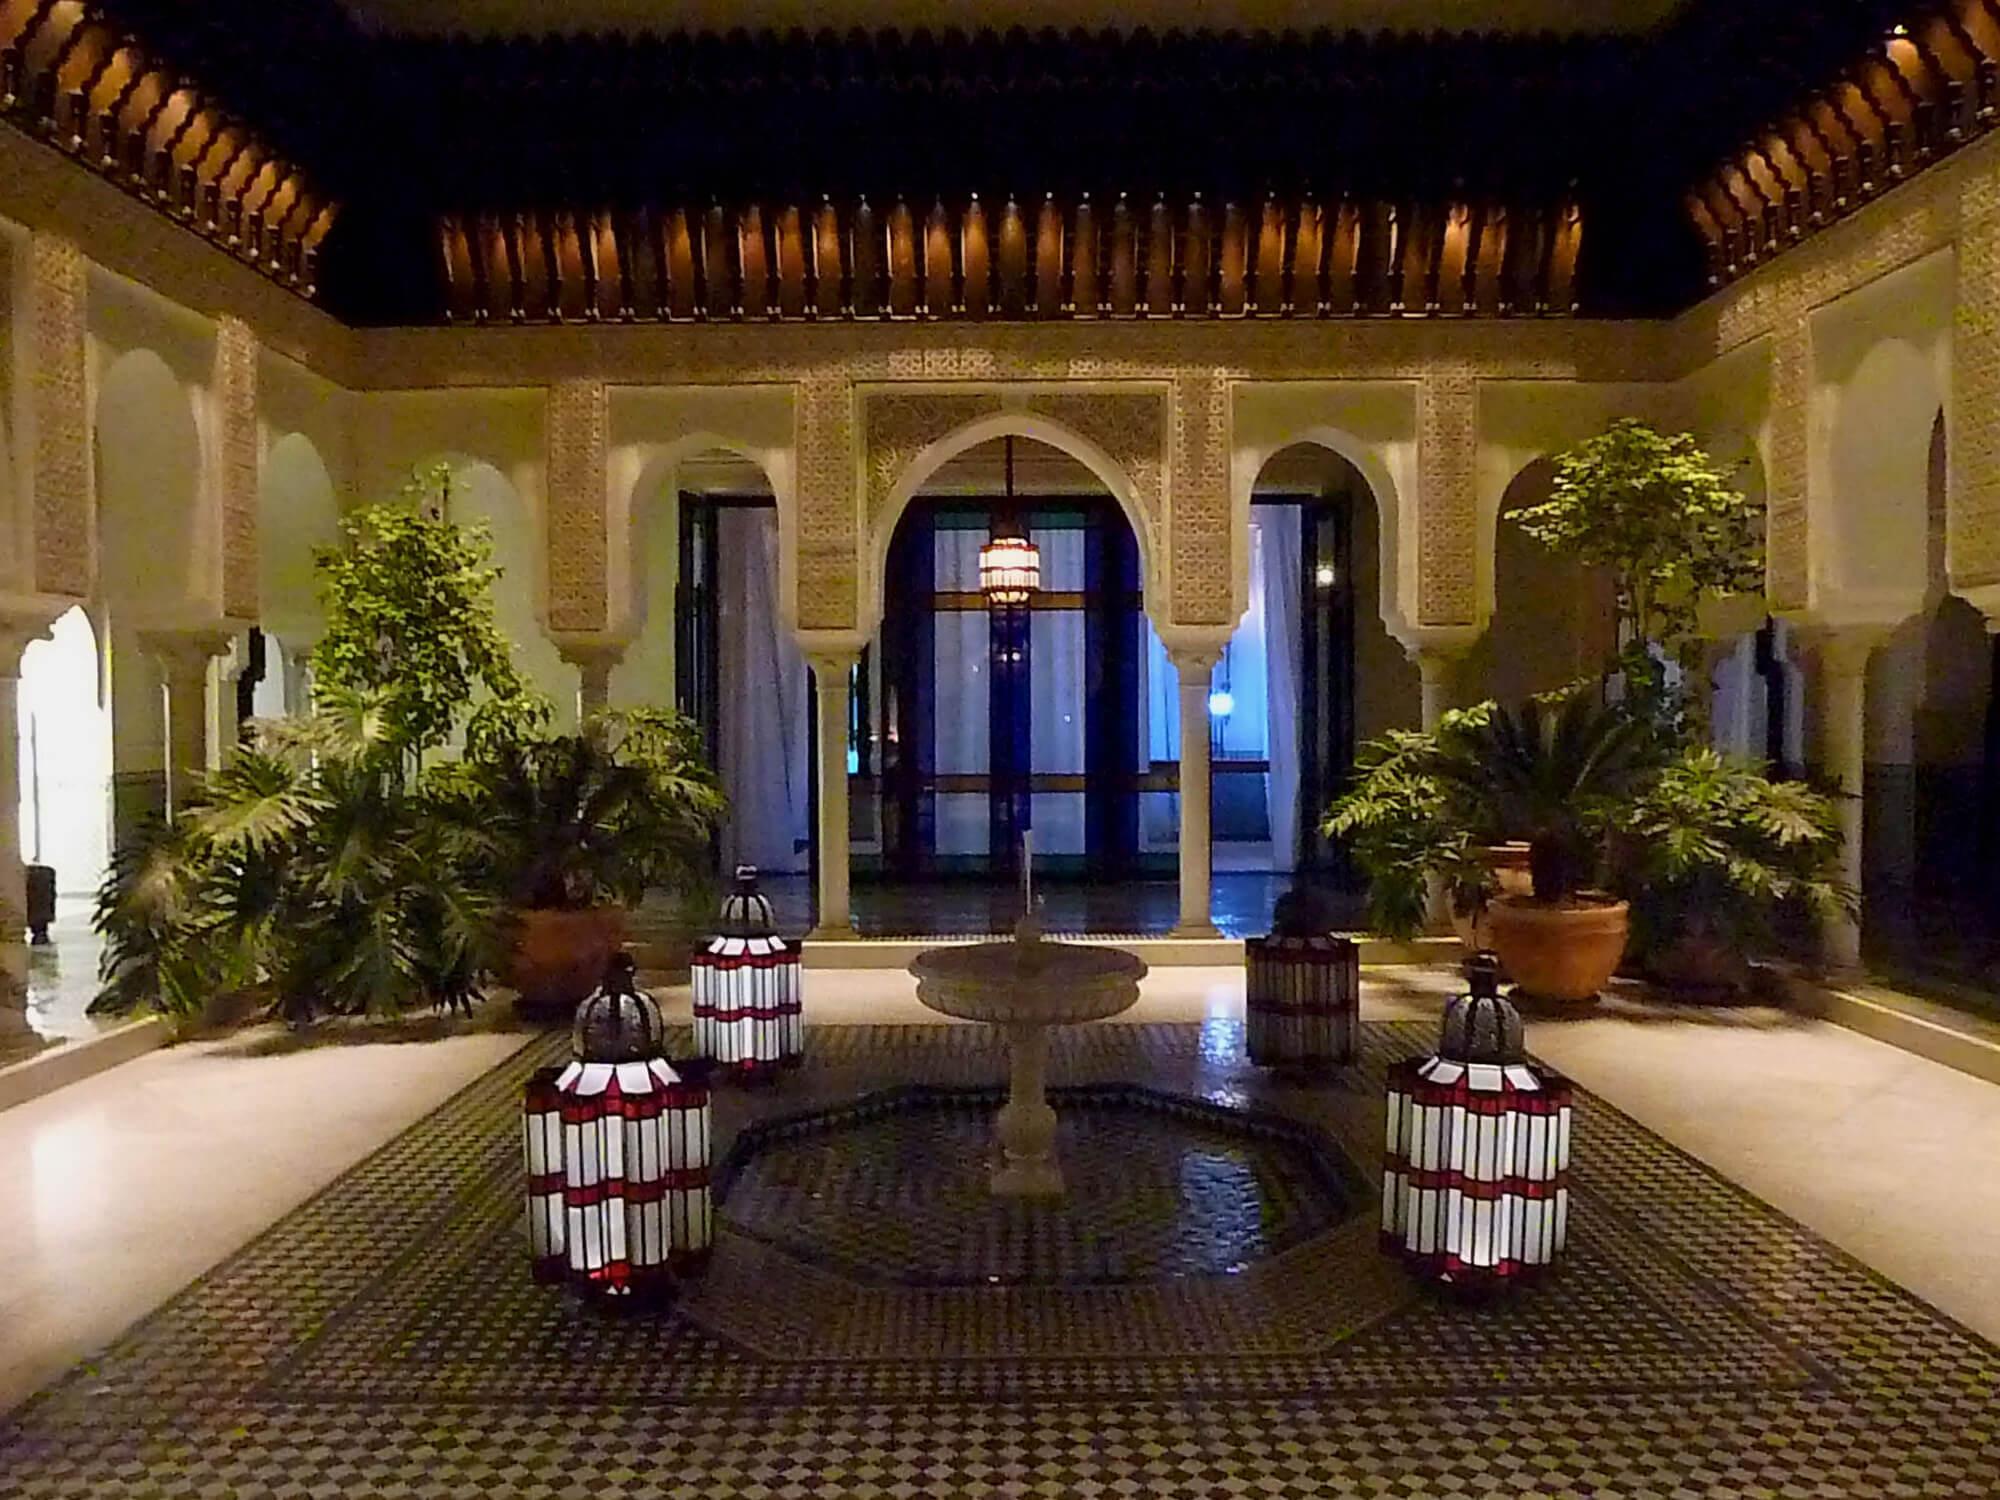 Sahara Desert Tour - A Trip to Best Hammams of Marrakech - Luxury Hammams and Spas